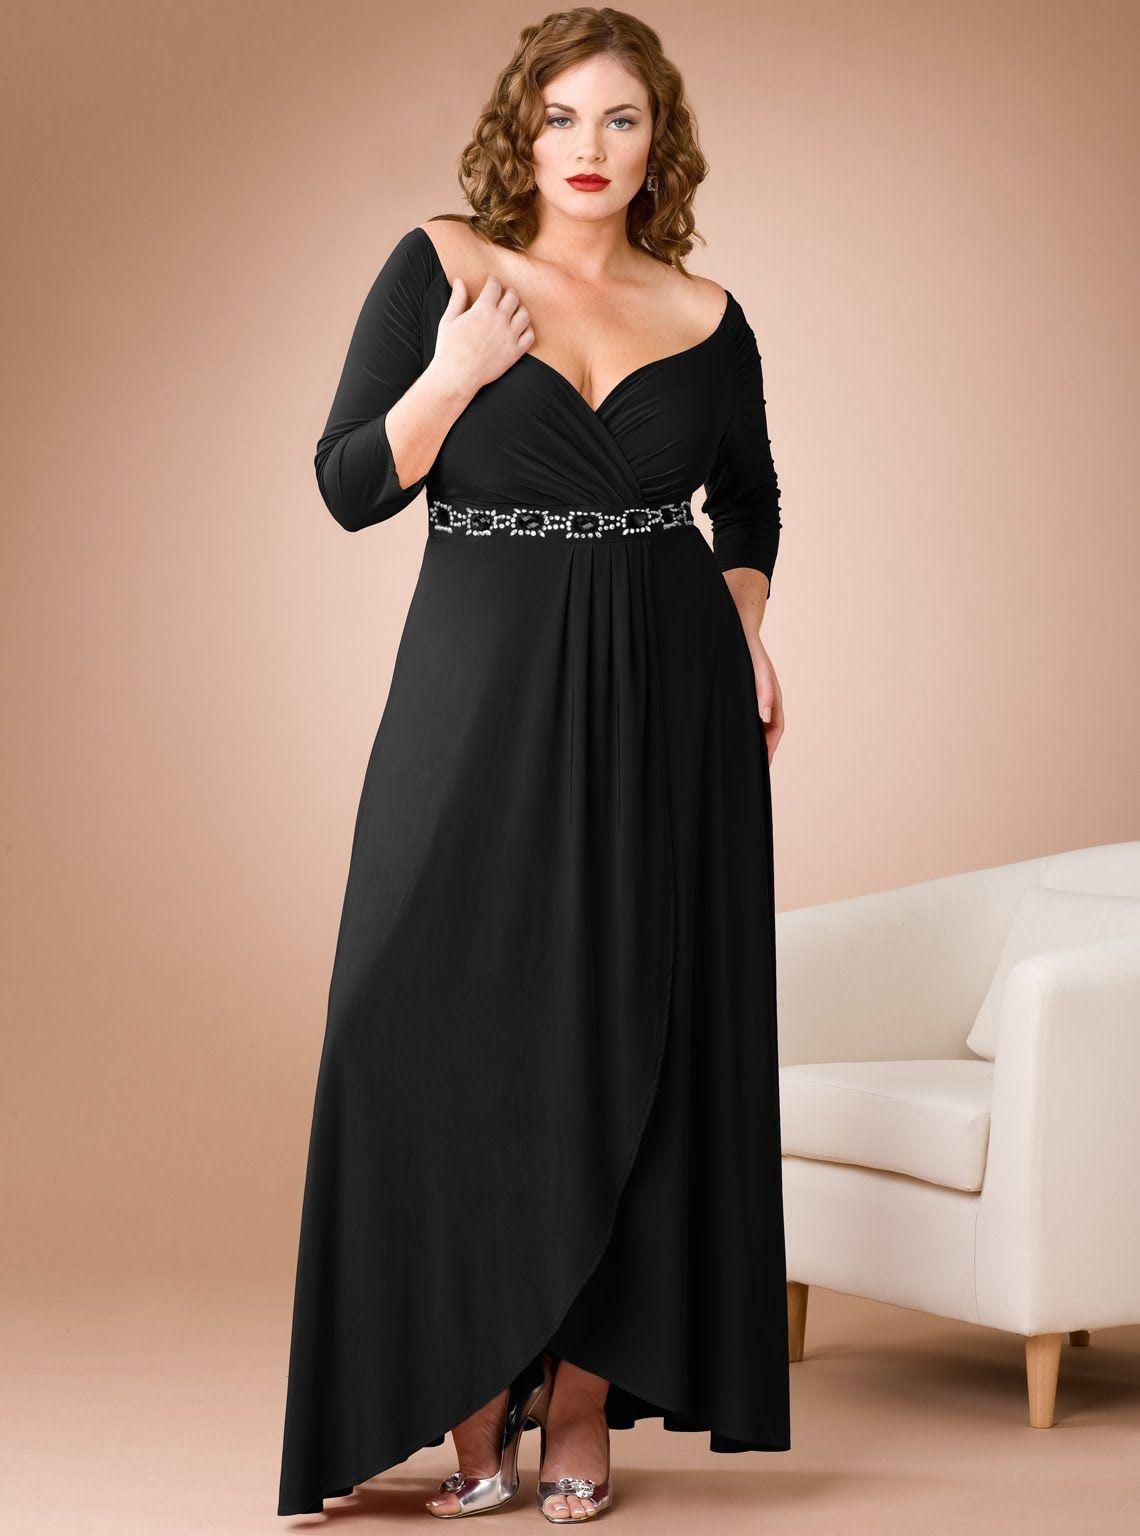 فساتين جديدة للسمينات التخان 2020 Bridesmaid Dresses Plus Size Bridesmaid Dresses With Sleeves Plus Size Formal Dresses